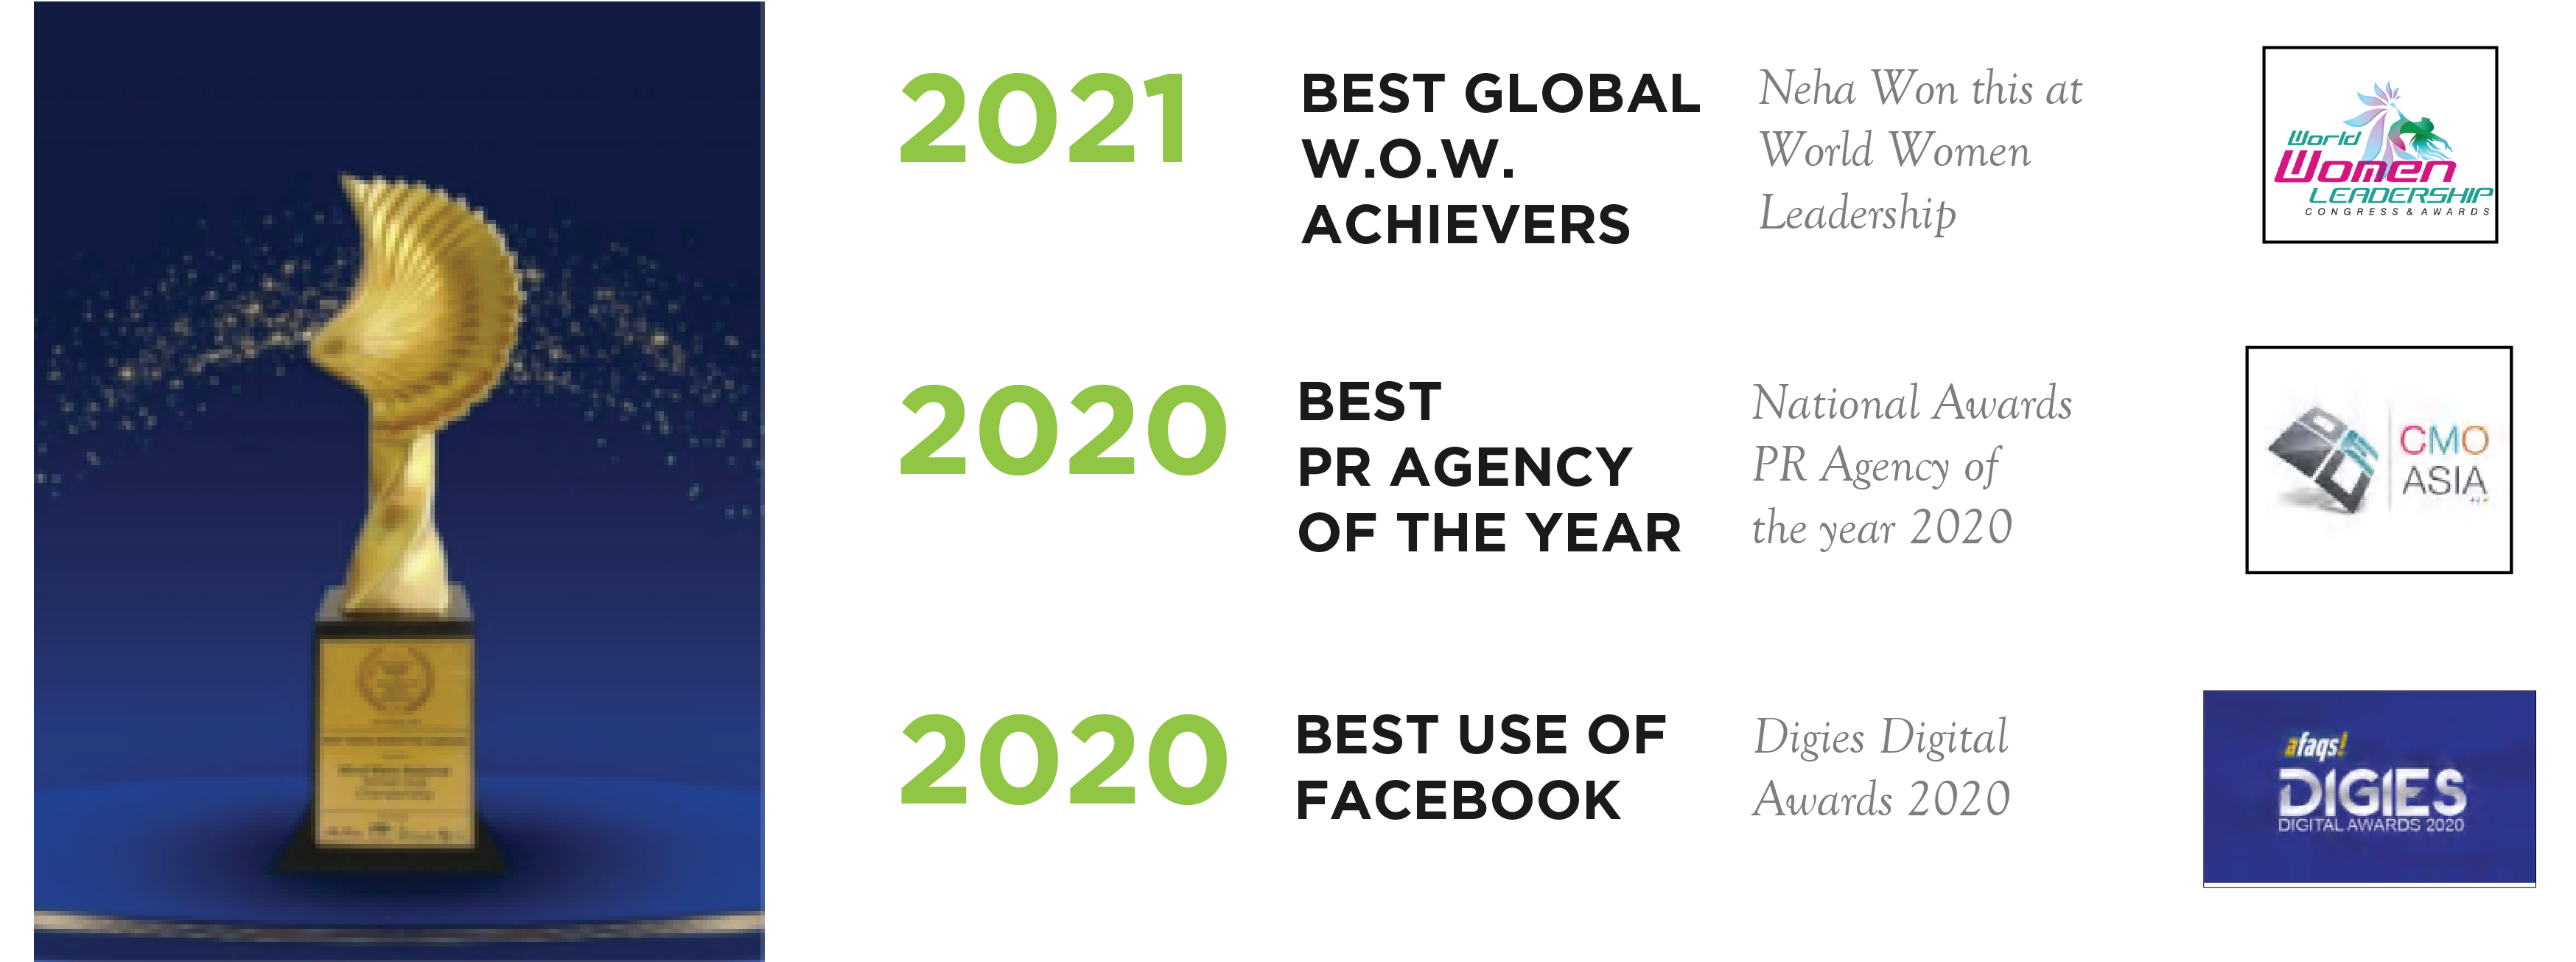 BB_Profile_Awards 2021 - 2020-03